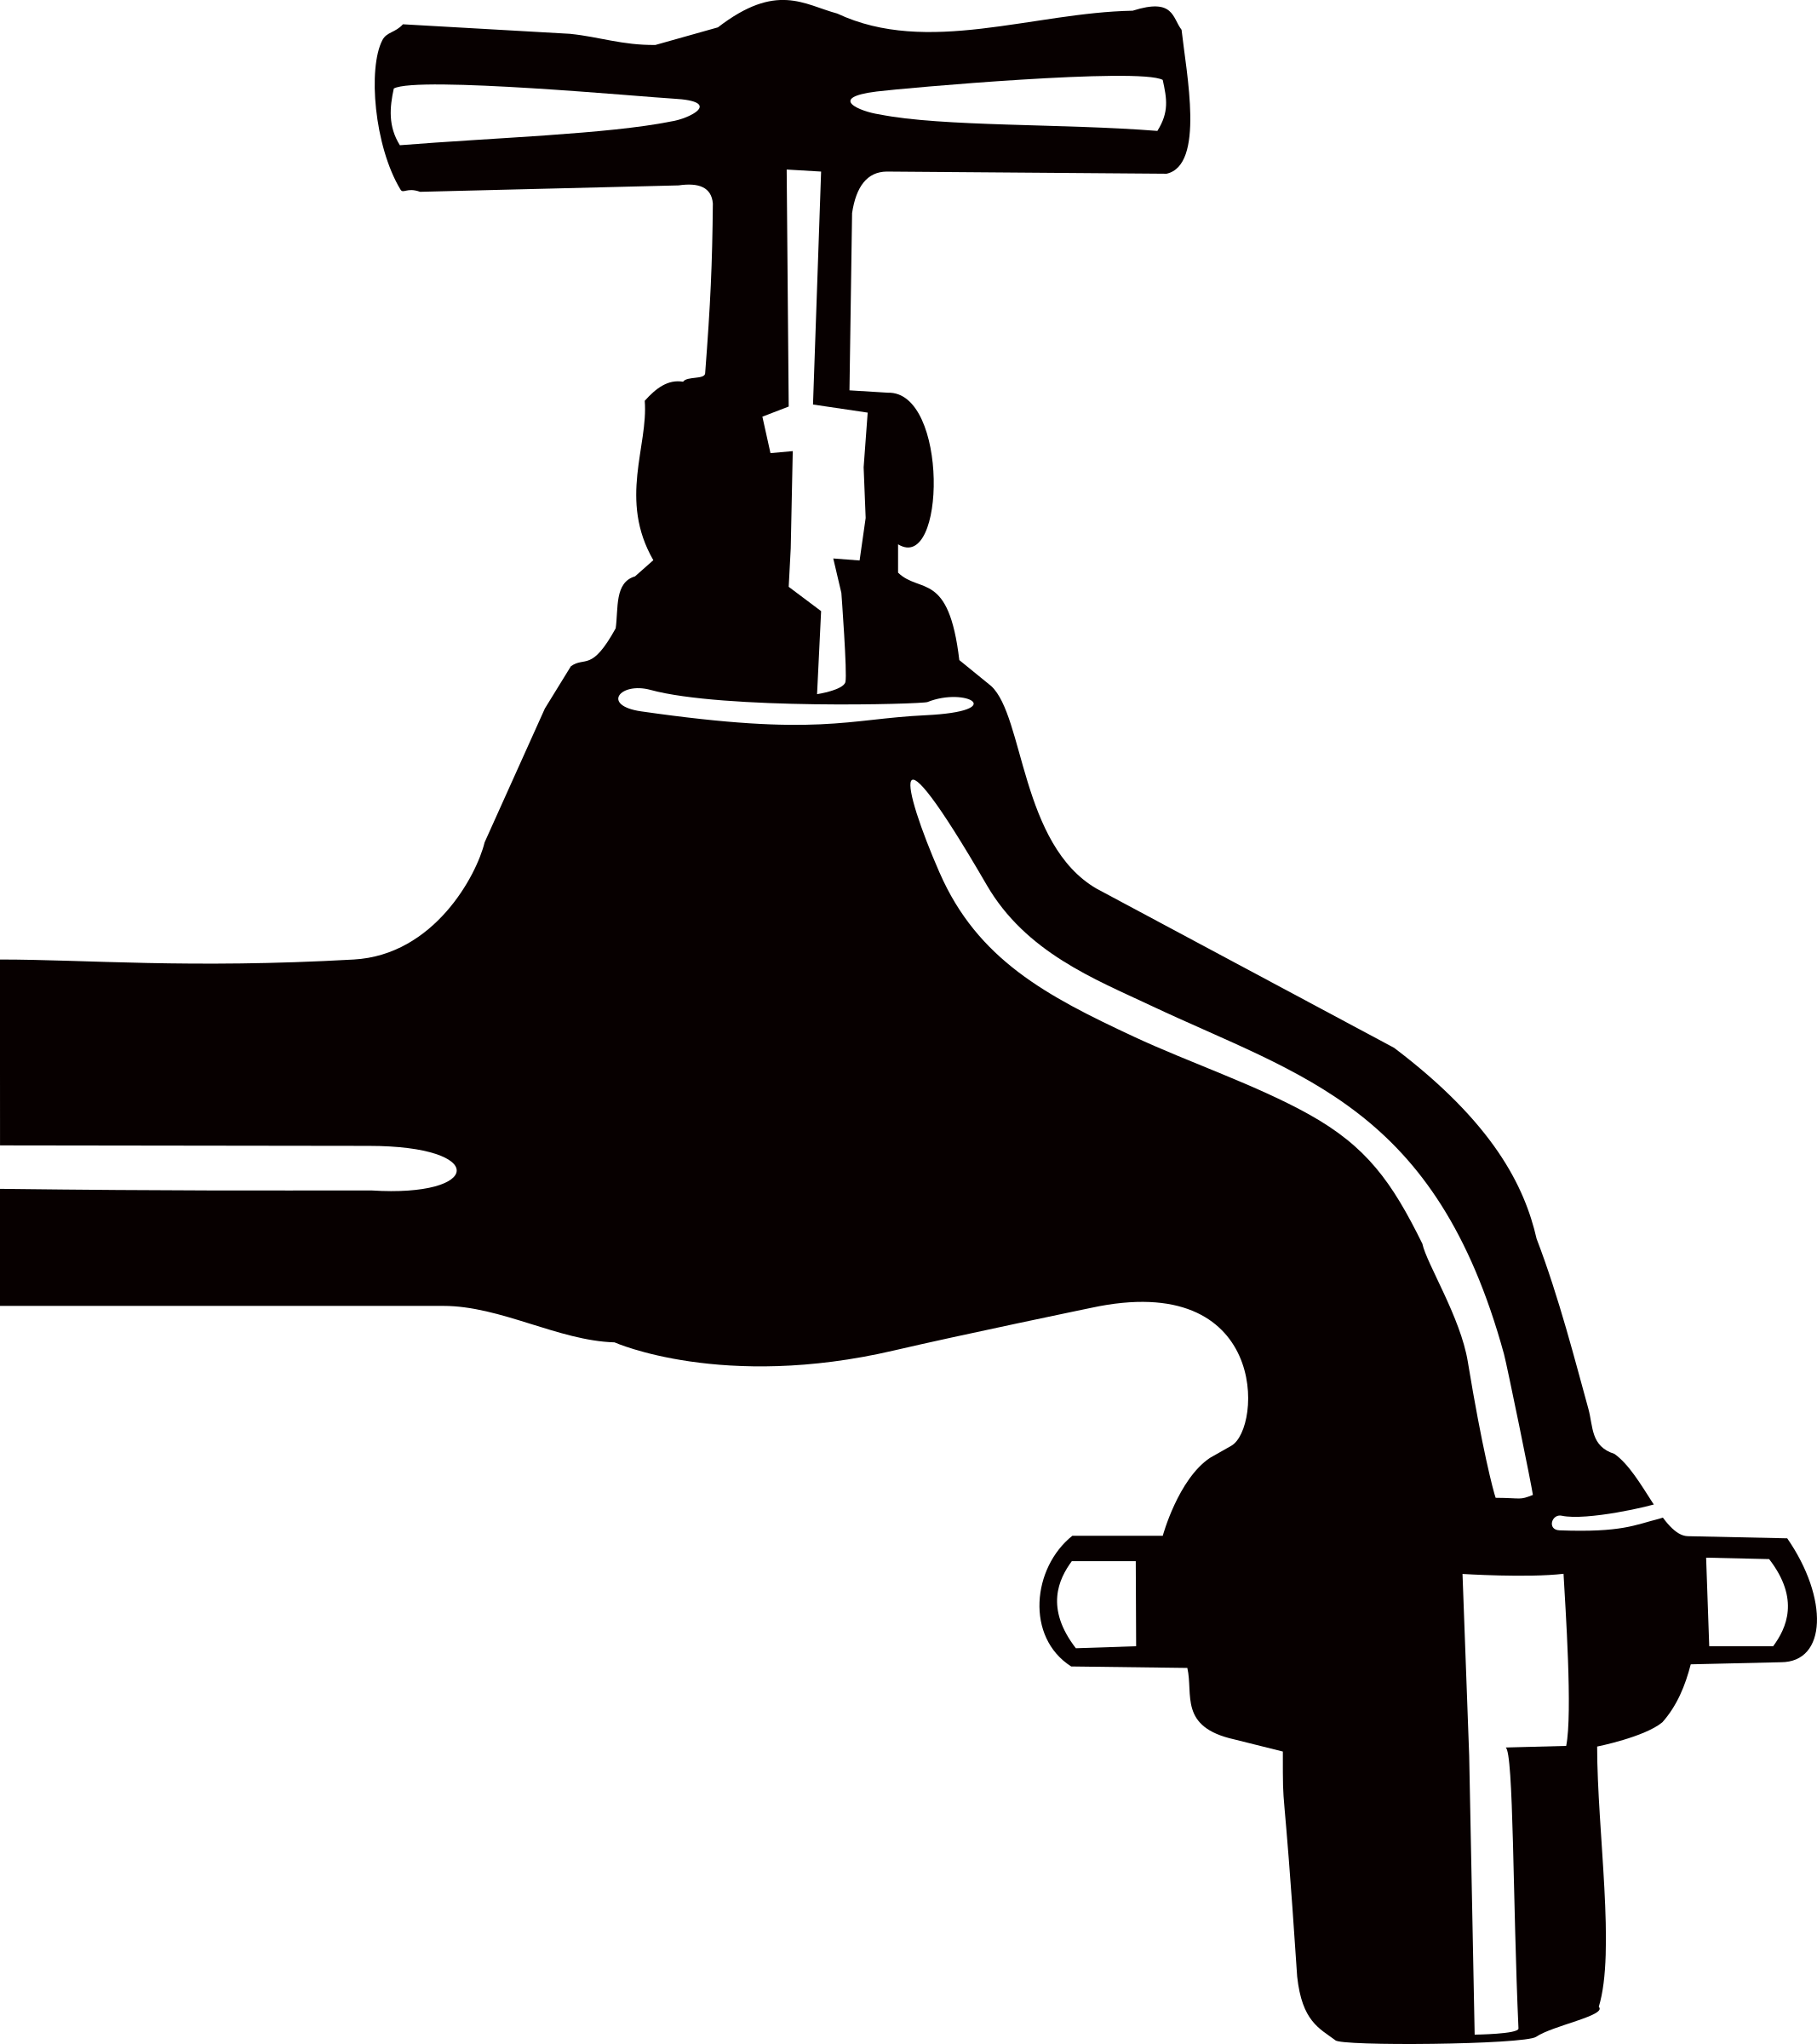 Faucet clipart bathtub faucet. Big image png